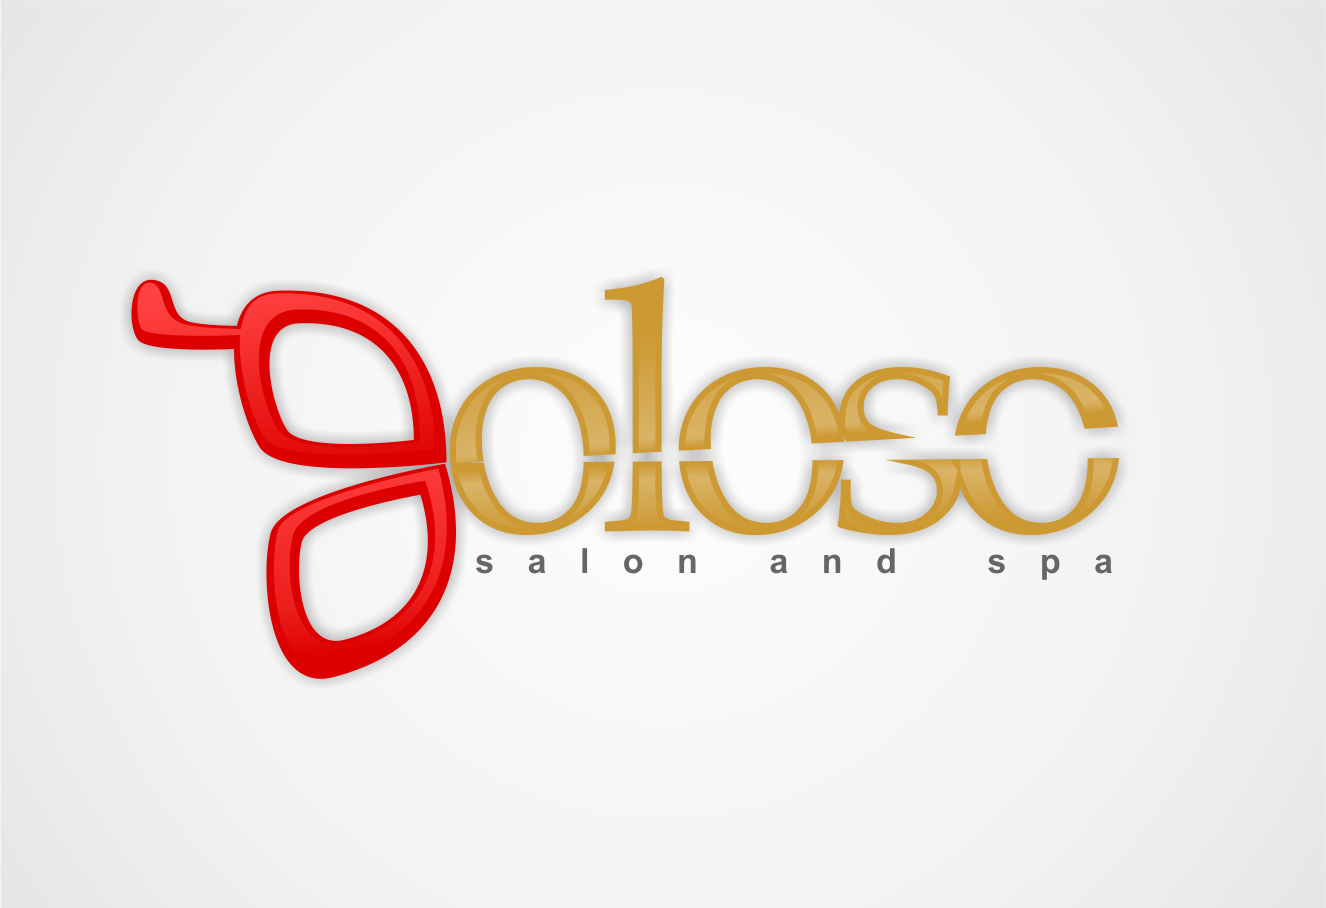 Logo Design by Mas an ibnu Zani Sutowo - Entry No. 75 in the Logo Design Contest Unique Logo Design Wanted for Goloso.